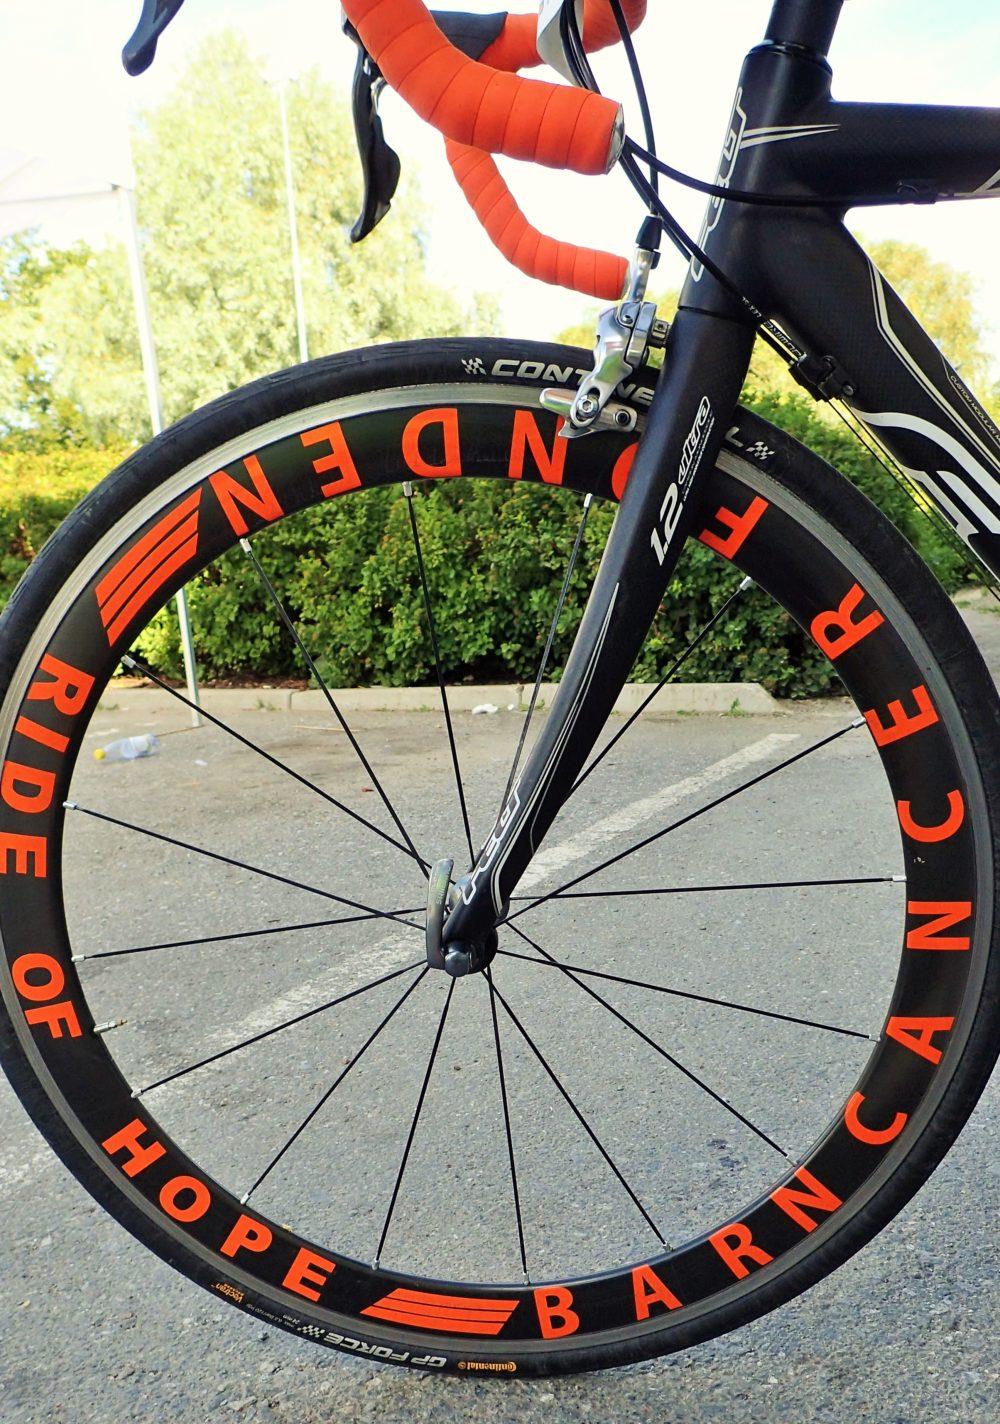 Ride of Hope-hjul!